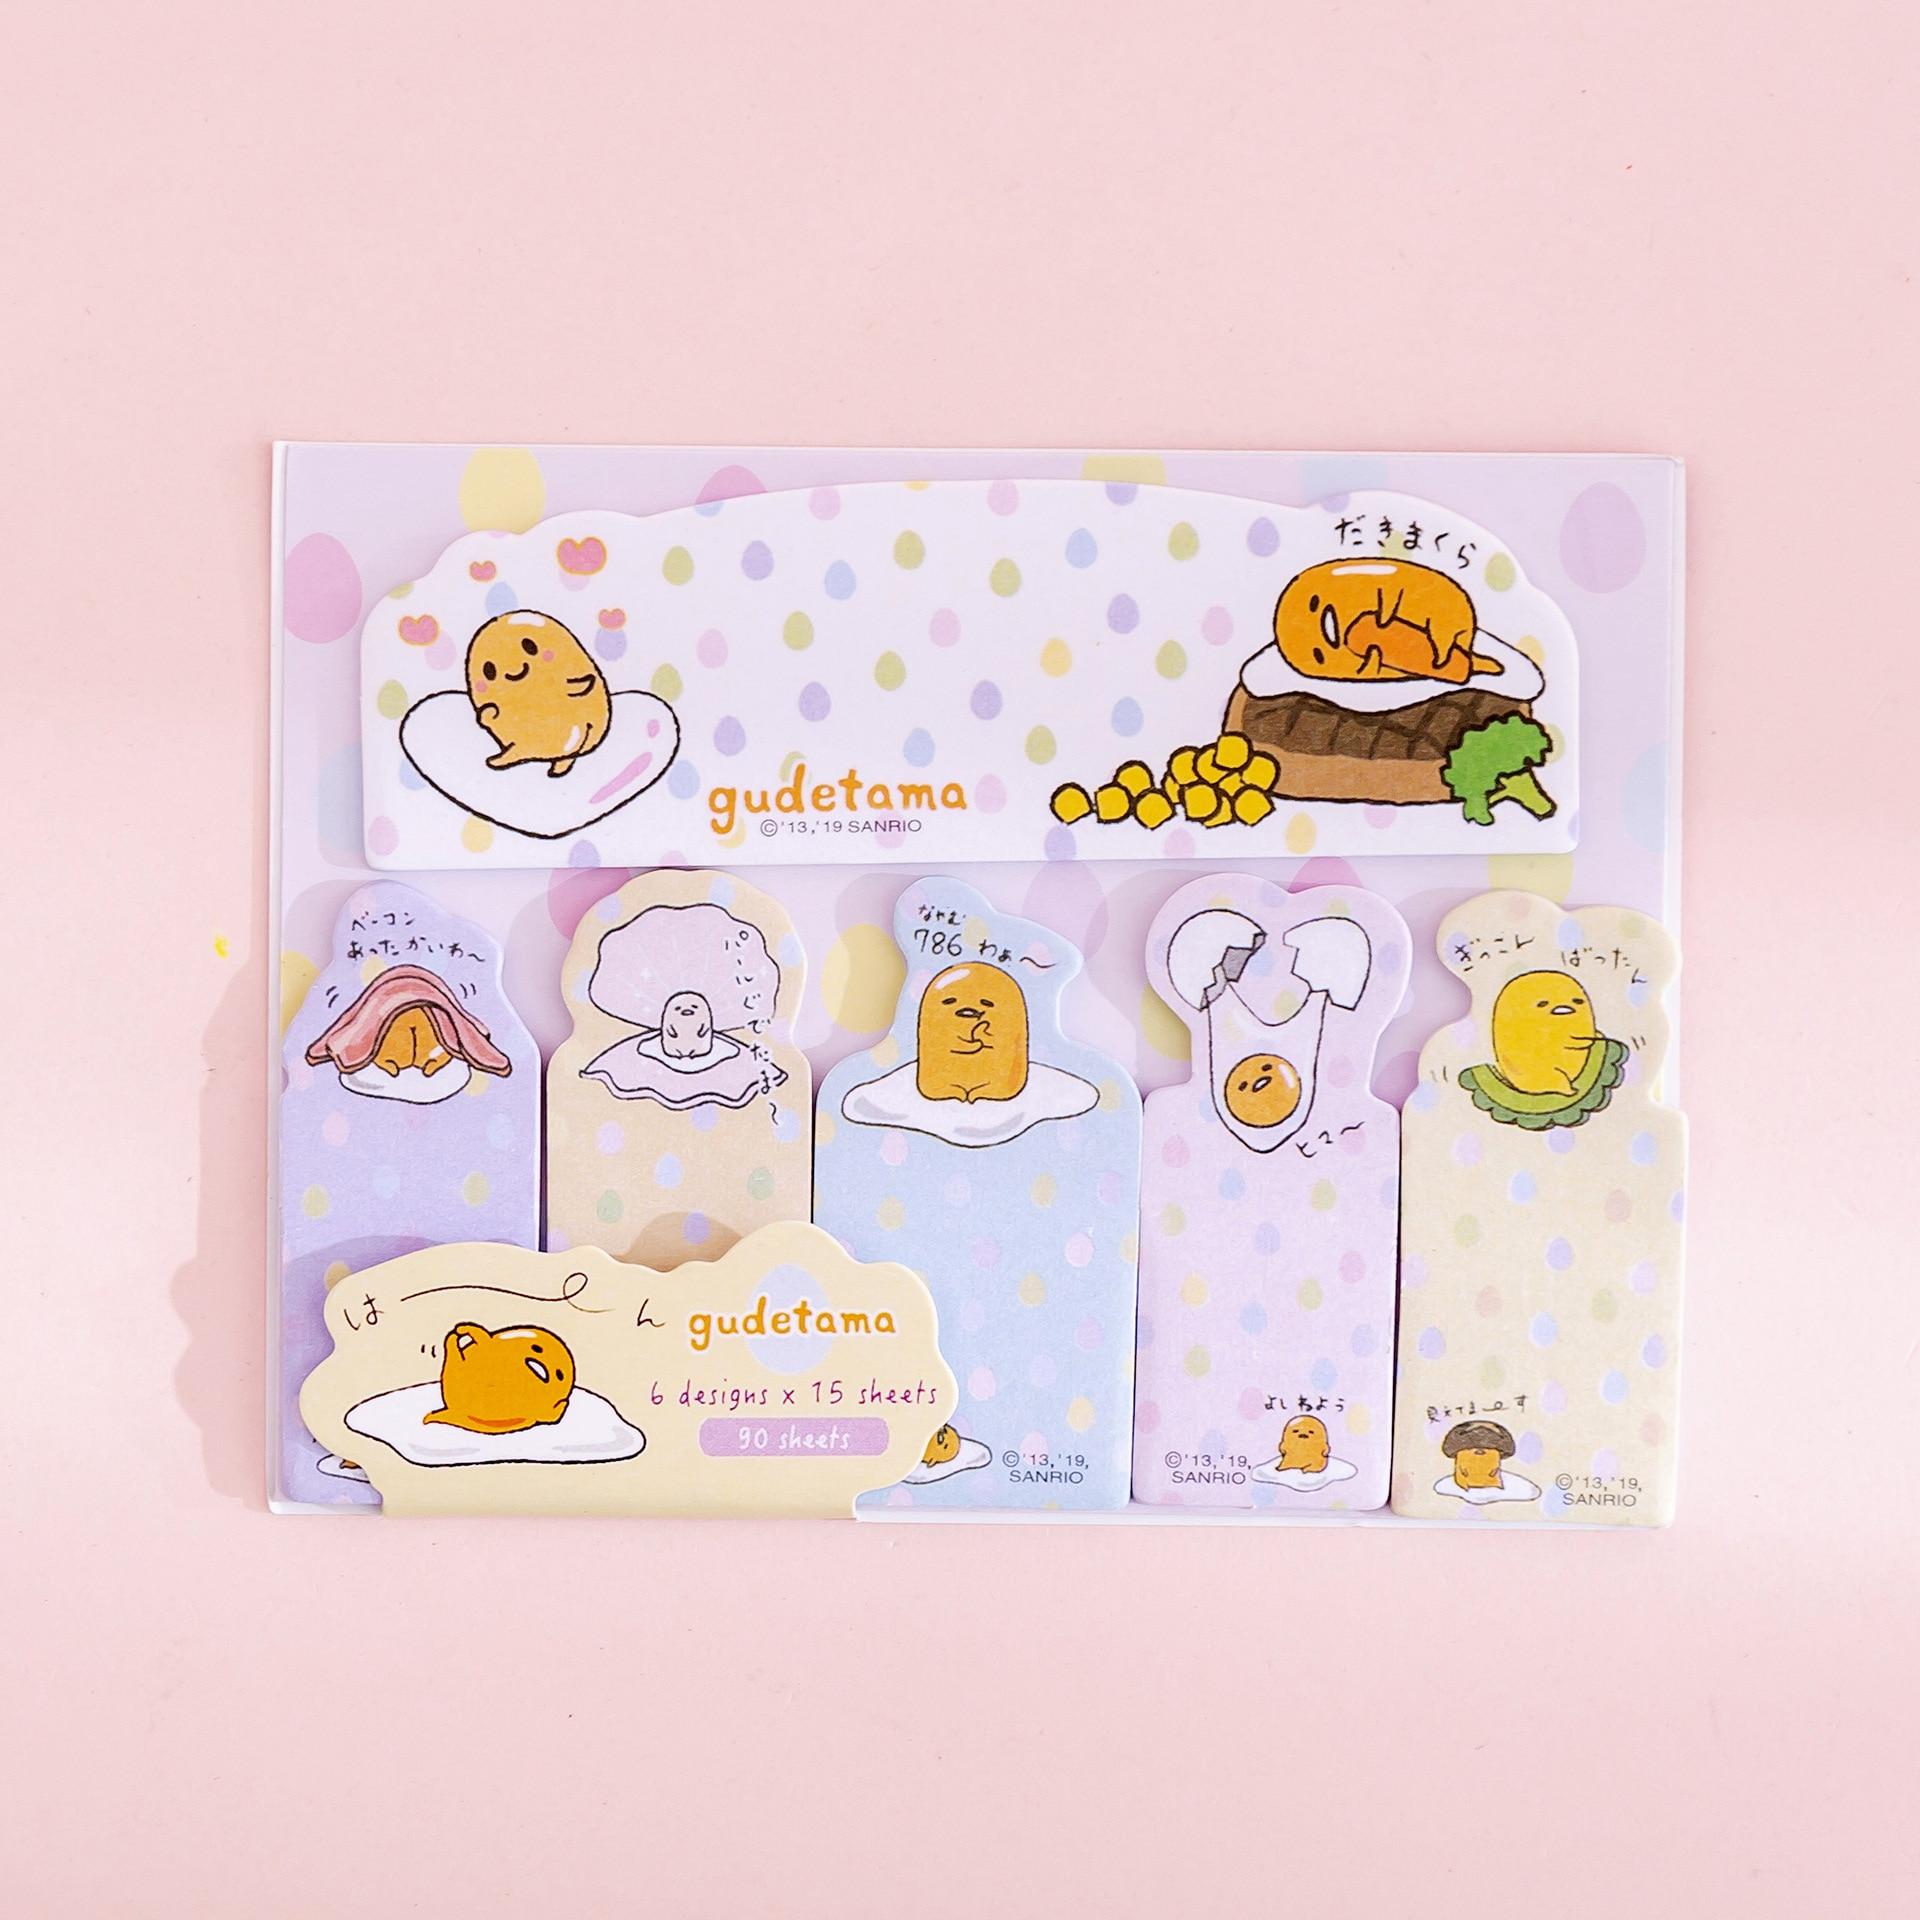 Kawaii Lazy Egg Gudetama Melody Twinstar Fingers Memo Pad Sticky Notes Memo Notepad School Office Supply Gift Stationery